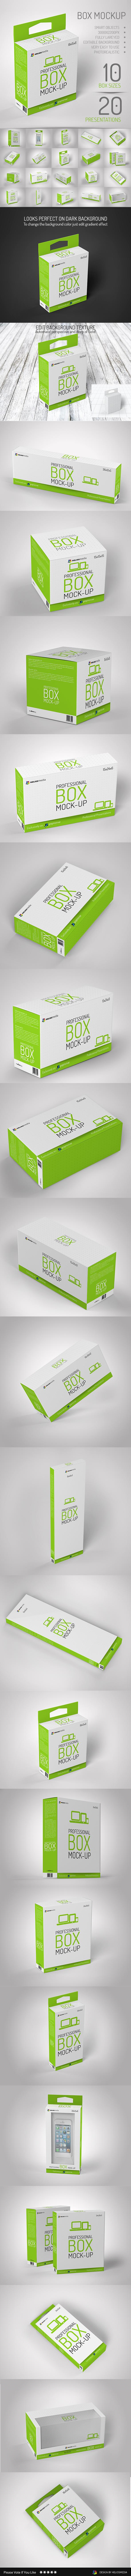 box cover identity mock up mock-up Mockup modern Multipurpose package photorealistic presentation product software Stationery